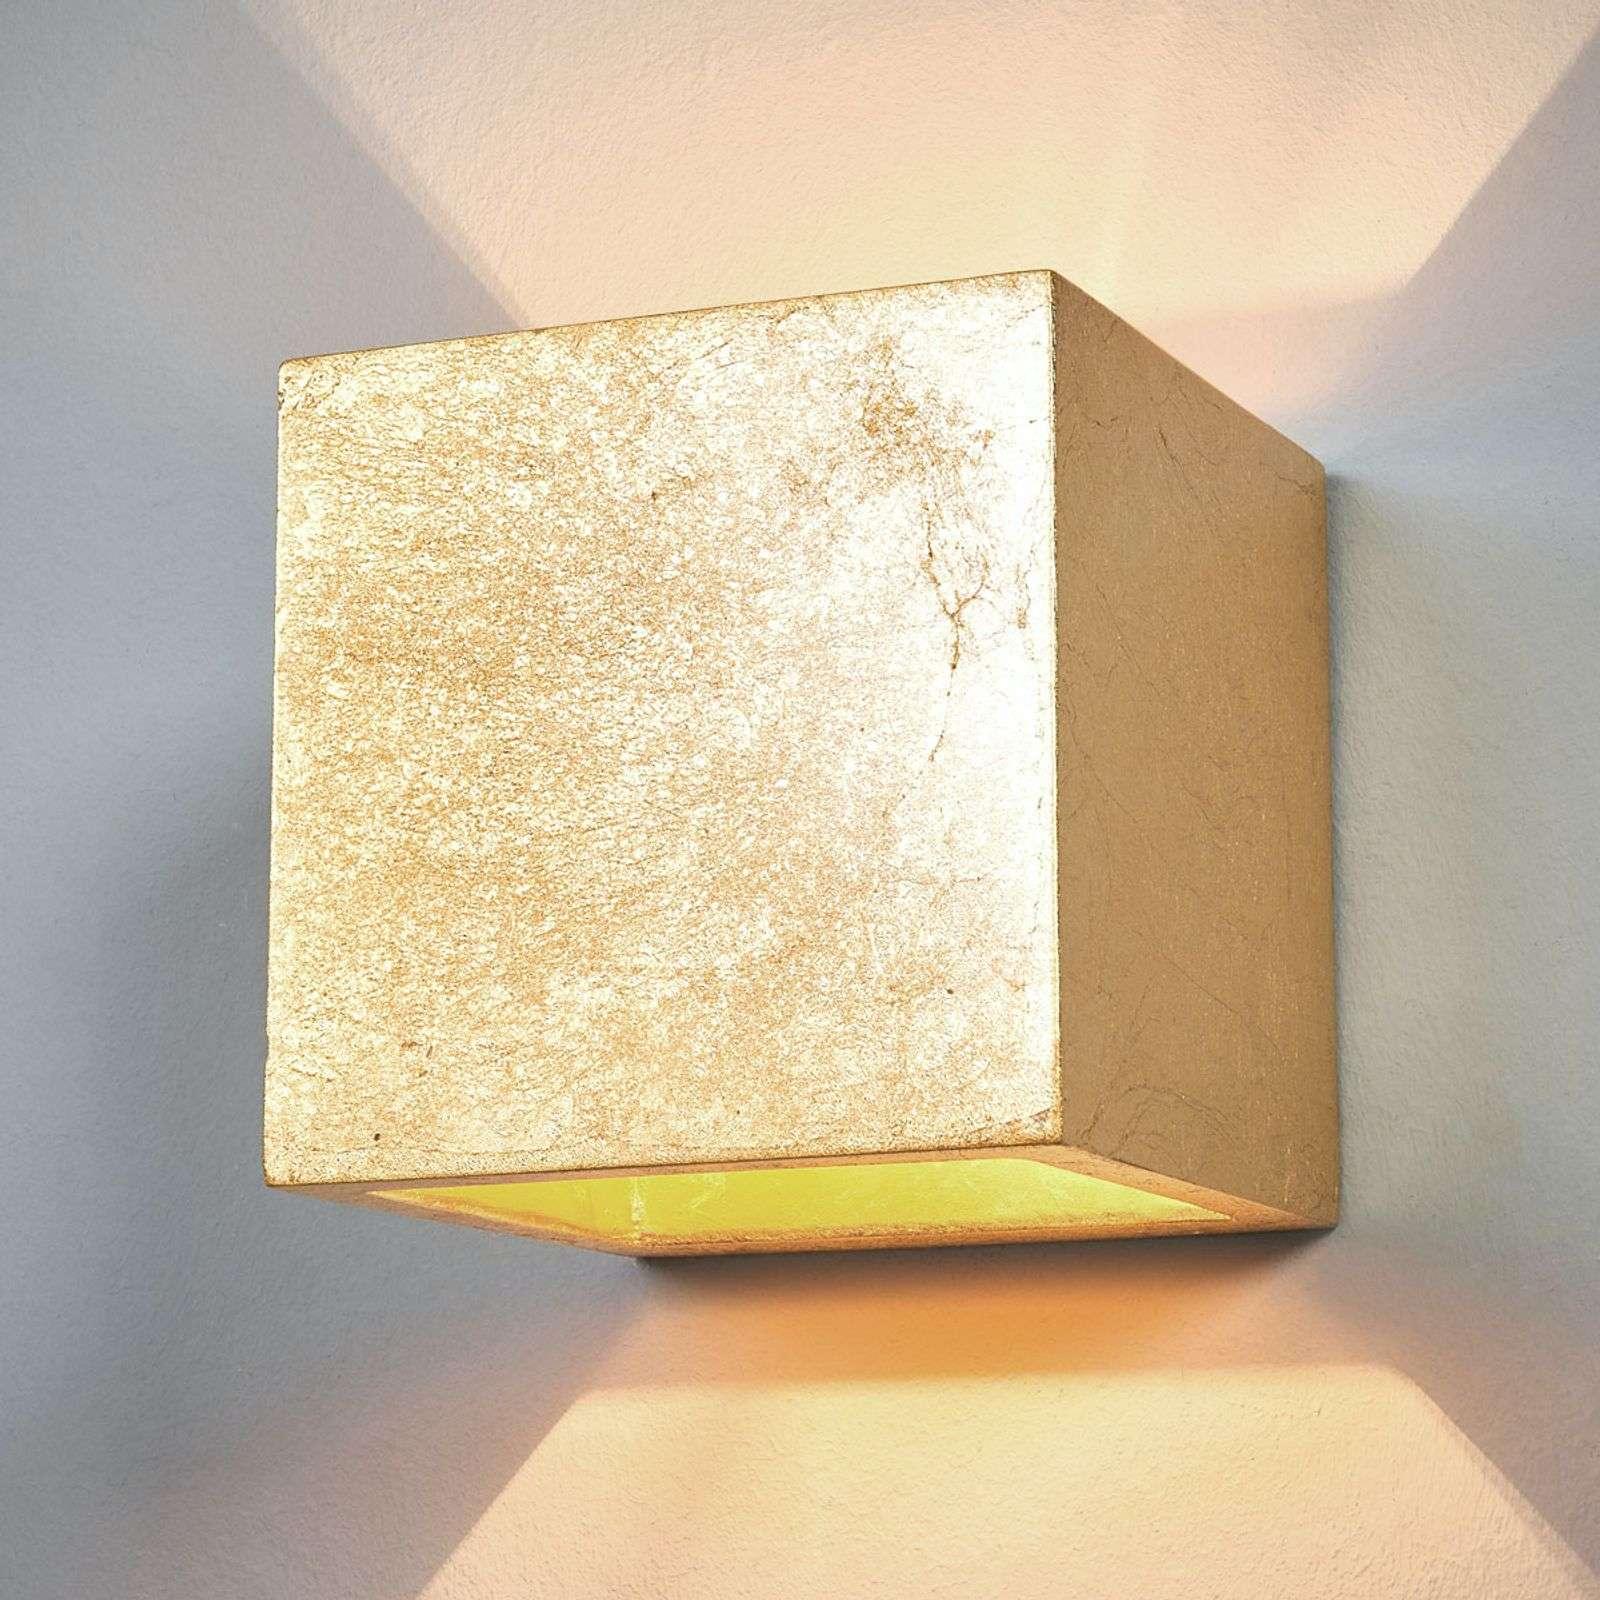 Full Size of Wandleuchte Schlafzimmer Bett Ikea Wandlampe Mit Stecker Wandleuchten Schalter Leselampe Led Holz Kabel Yade Wrfel Gold Lampenwelt Flur Gardinen Deckenlampe Wohnzimmer Schlafzimmer Wandleuchte